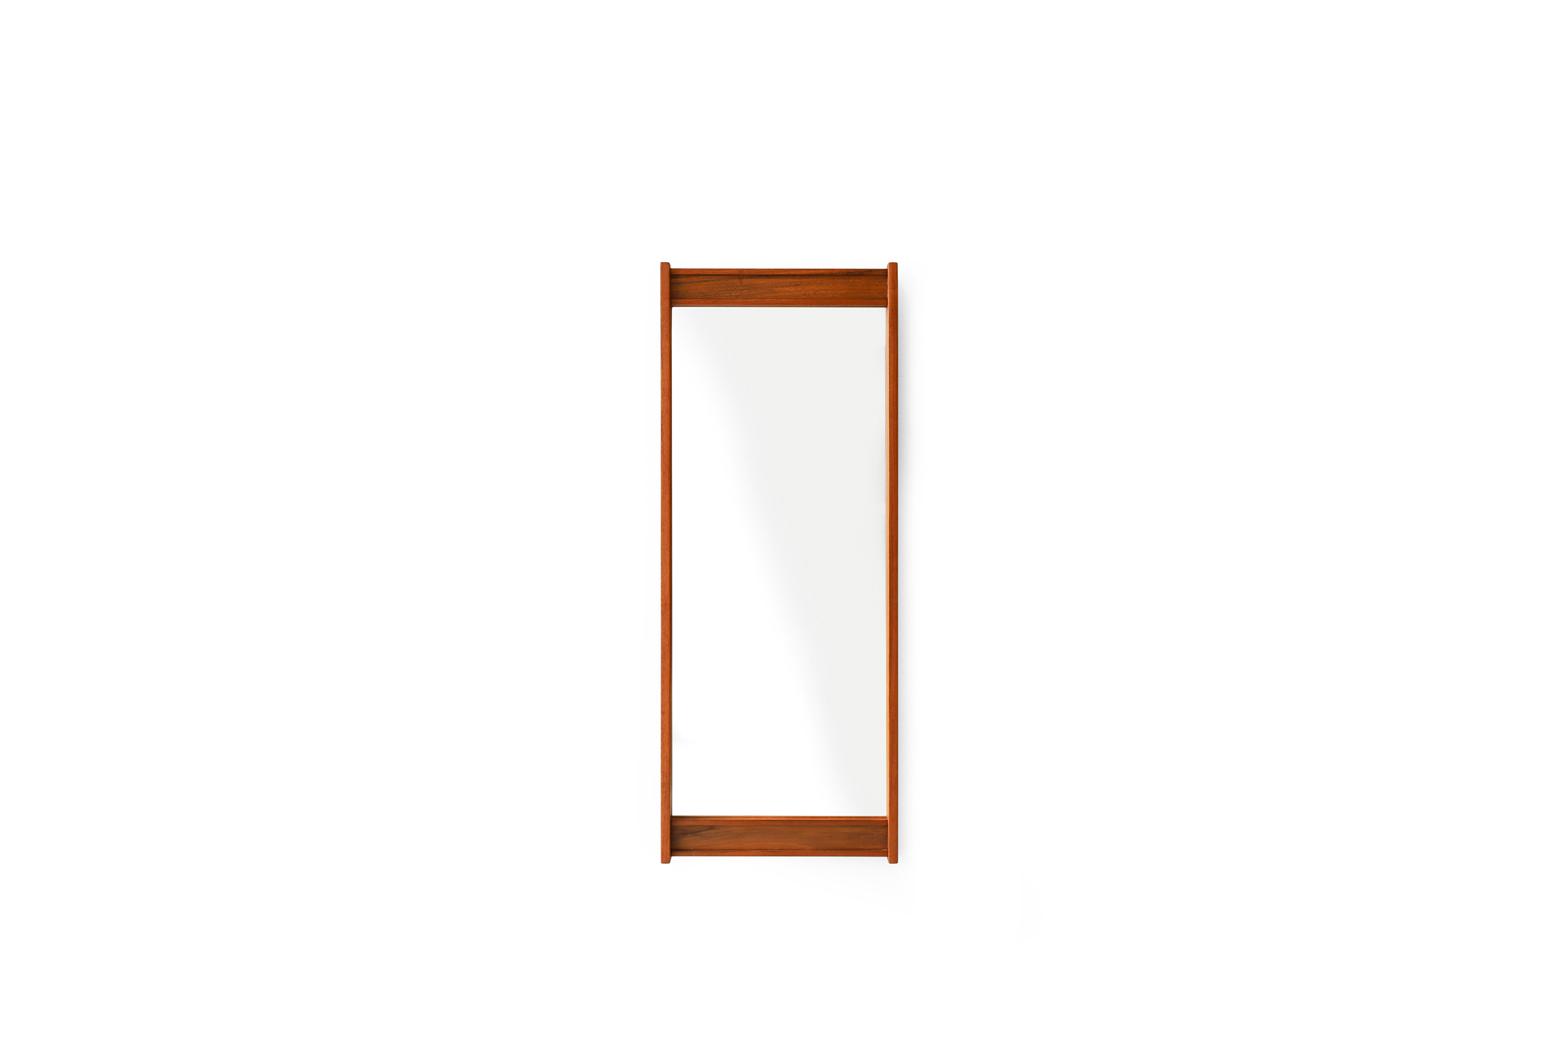 Danish Vintage Teakwood Wall Hanging Mirror/デンマークヴィンテージ ウォールミラー チーク材 壁掛け鏡 北欧インテリア